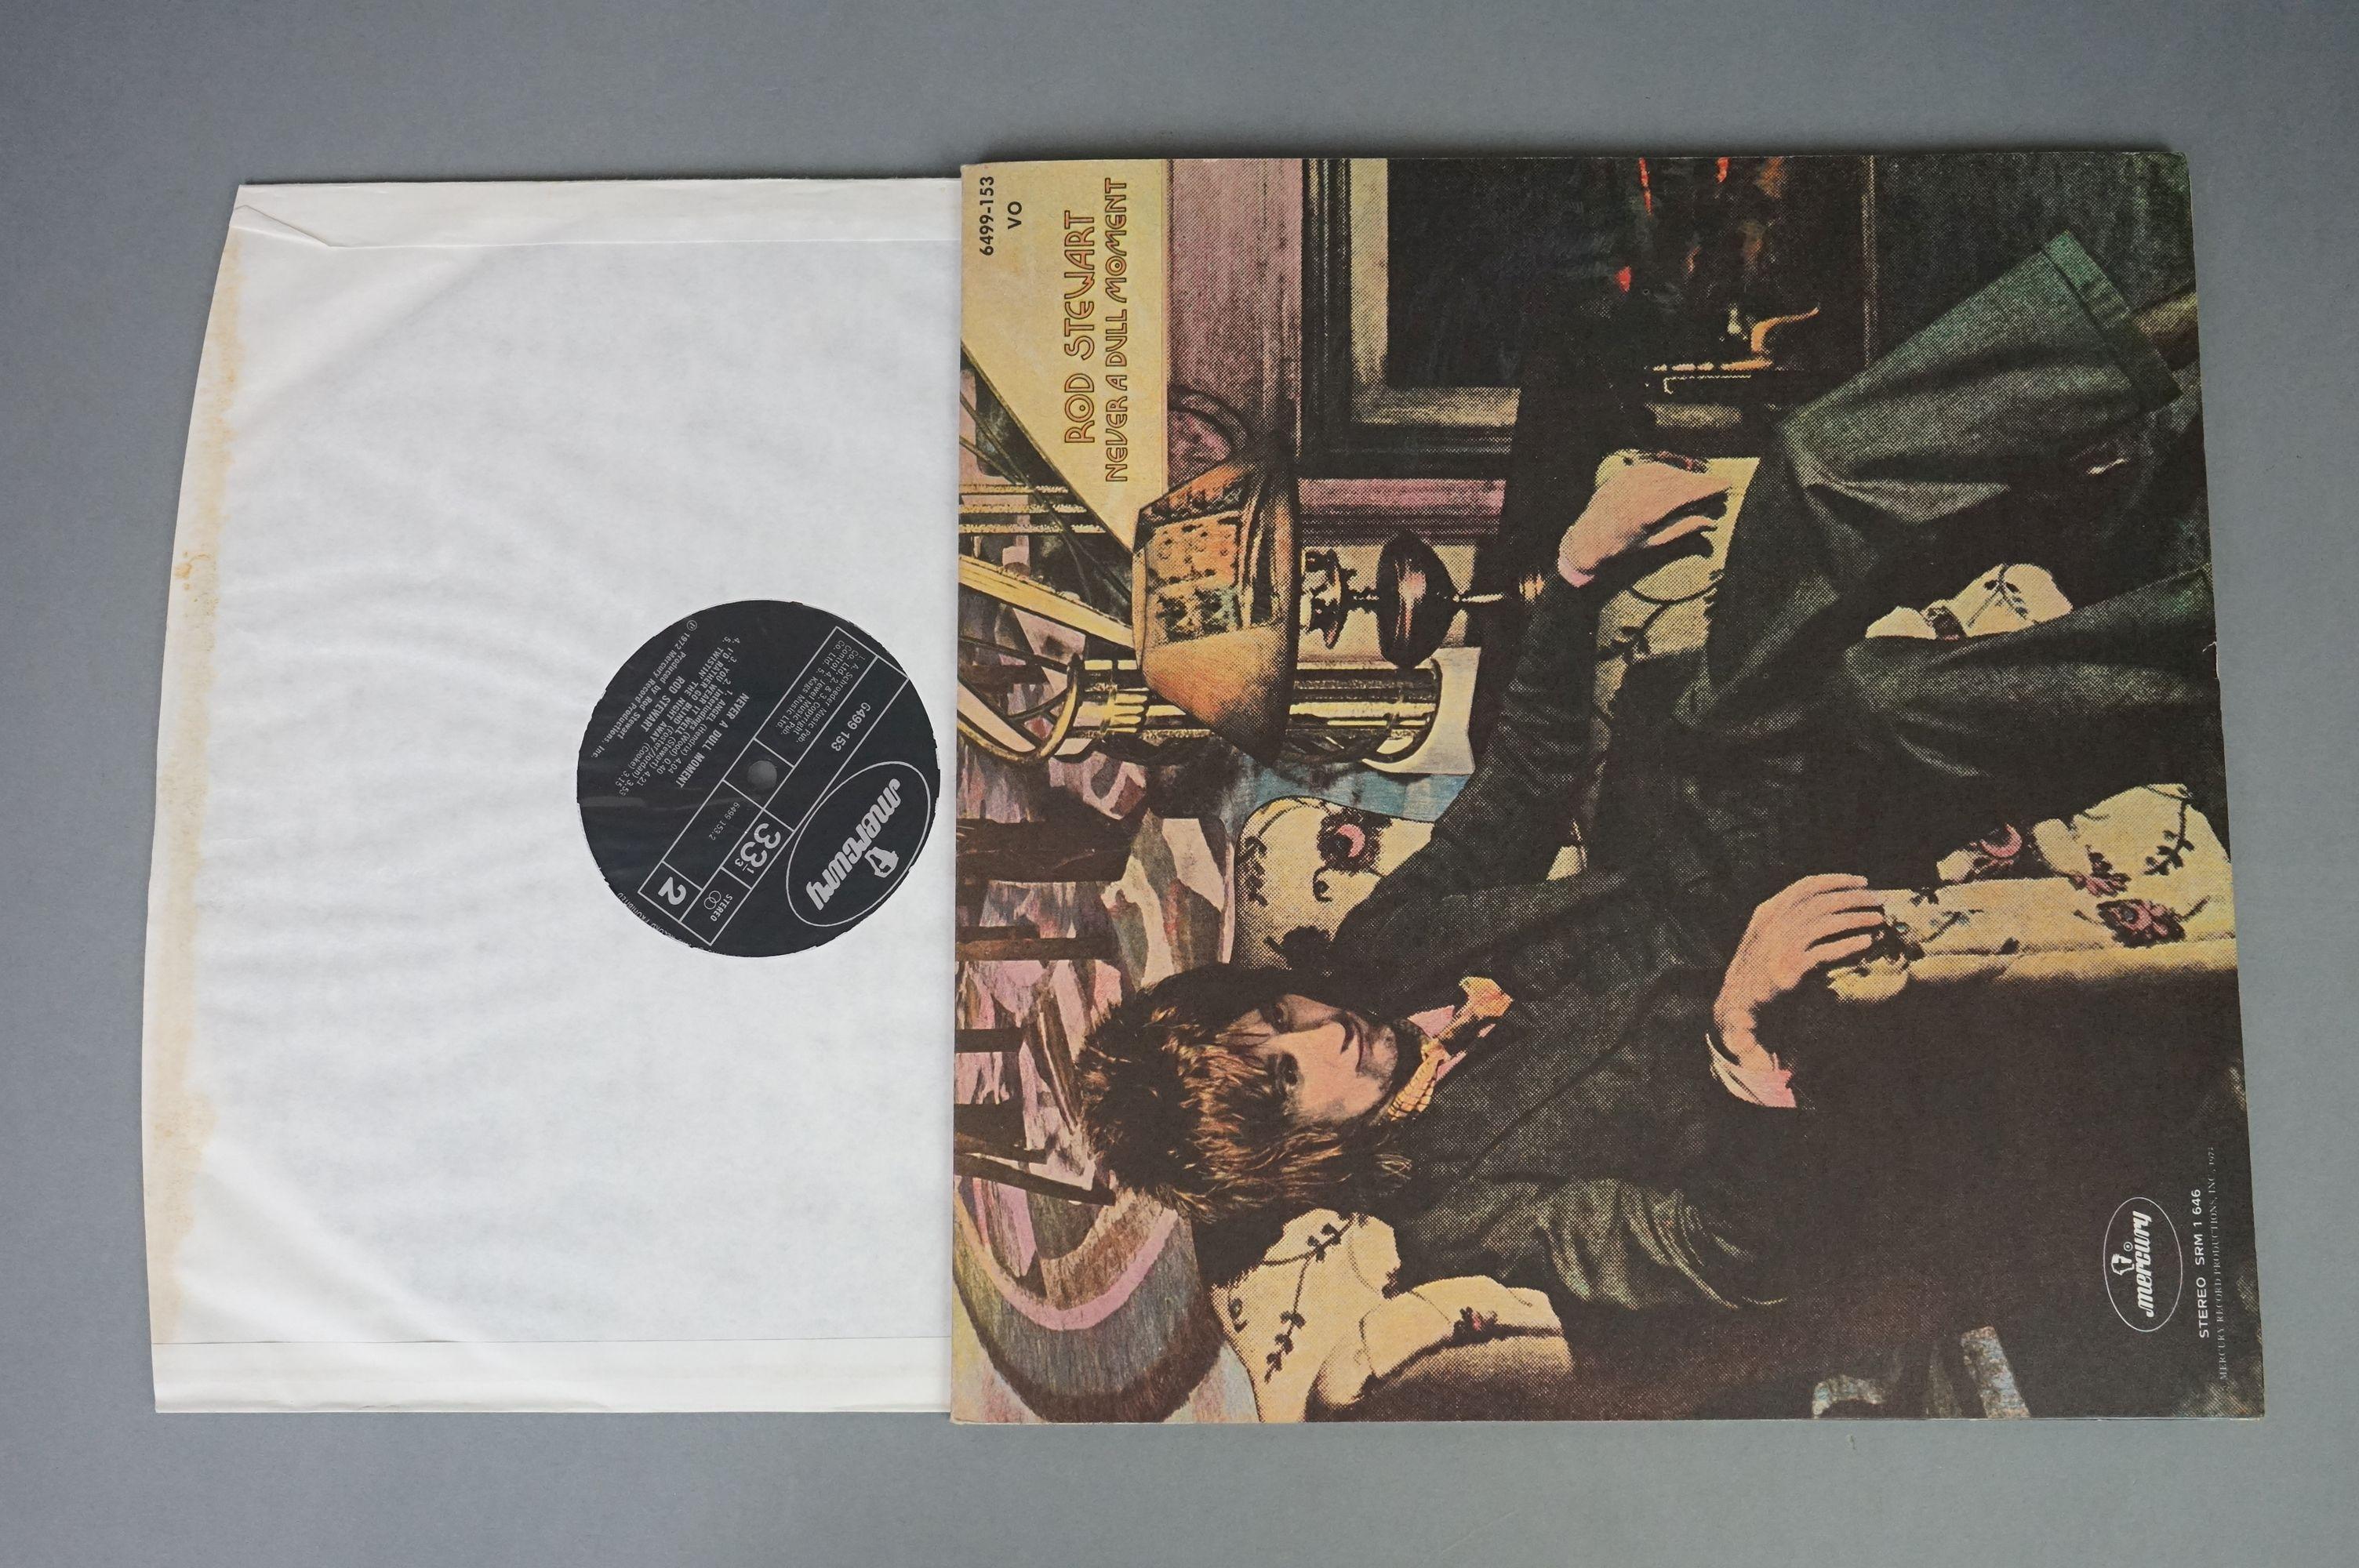 Vinyl - Rod Stewart 4 LP's to include An Old Raincoat Won't Ever Let You Down (Vertigo VO4) gatefold - Image 2 of 14